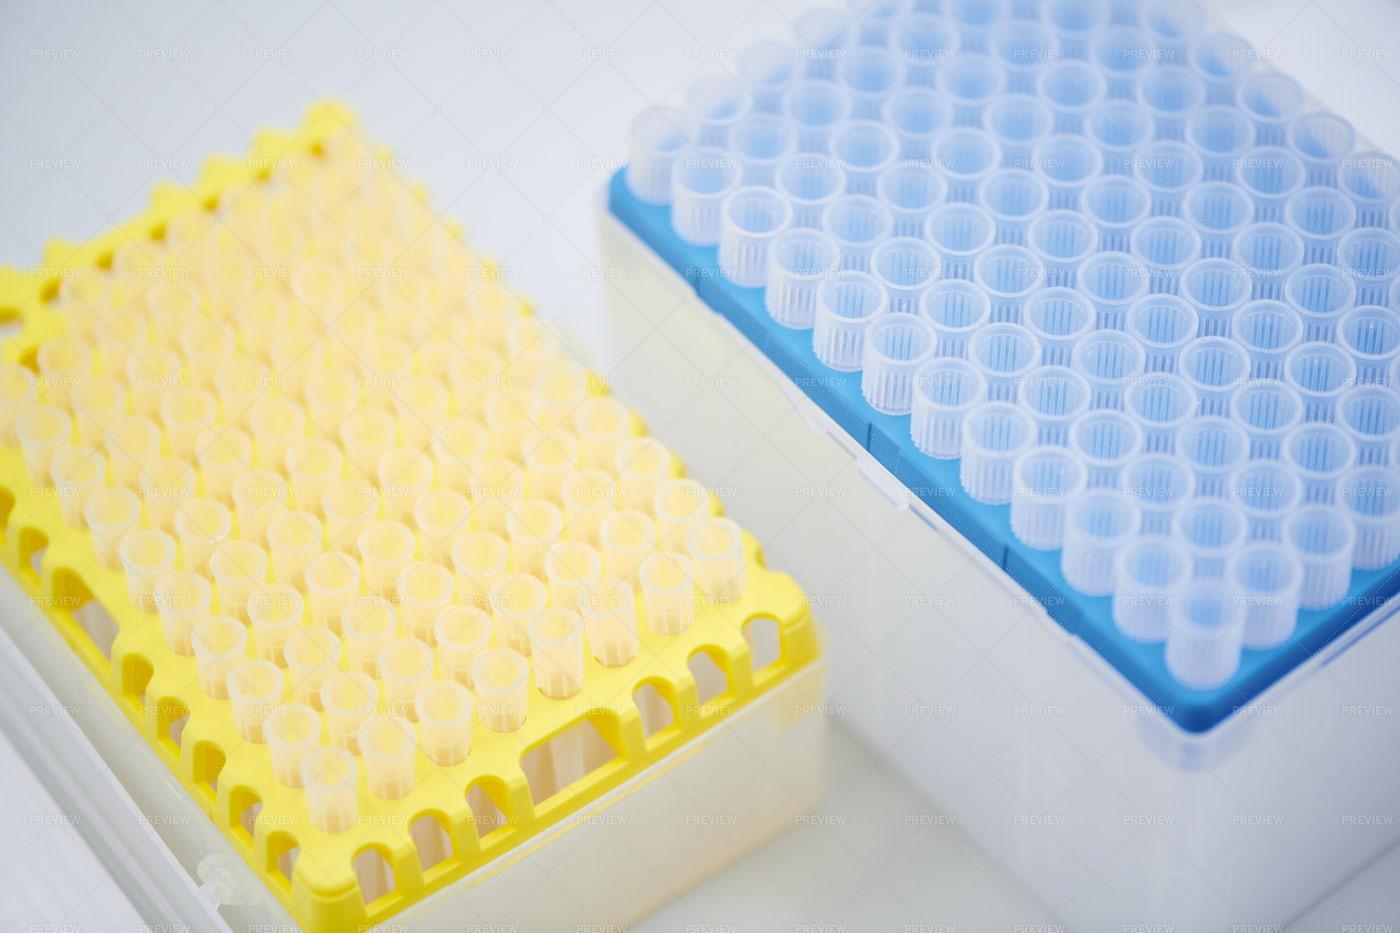 Plastic Test Tube Rack: Stock Photos